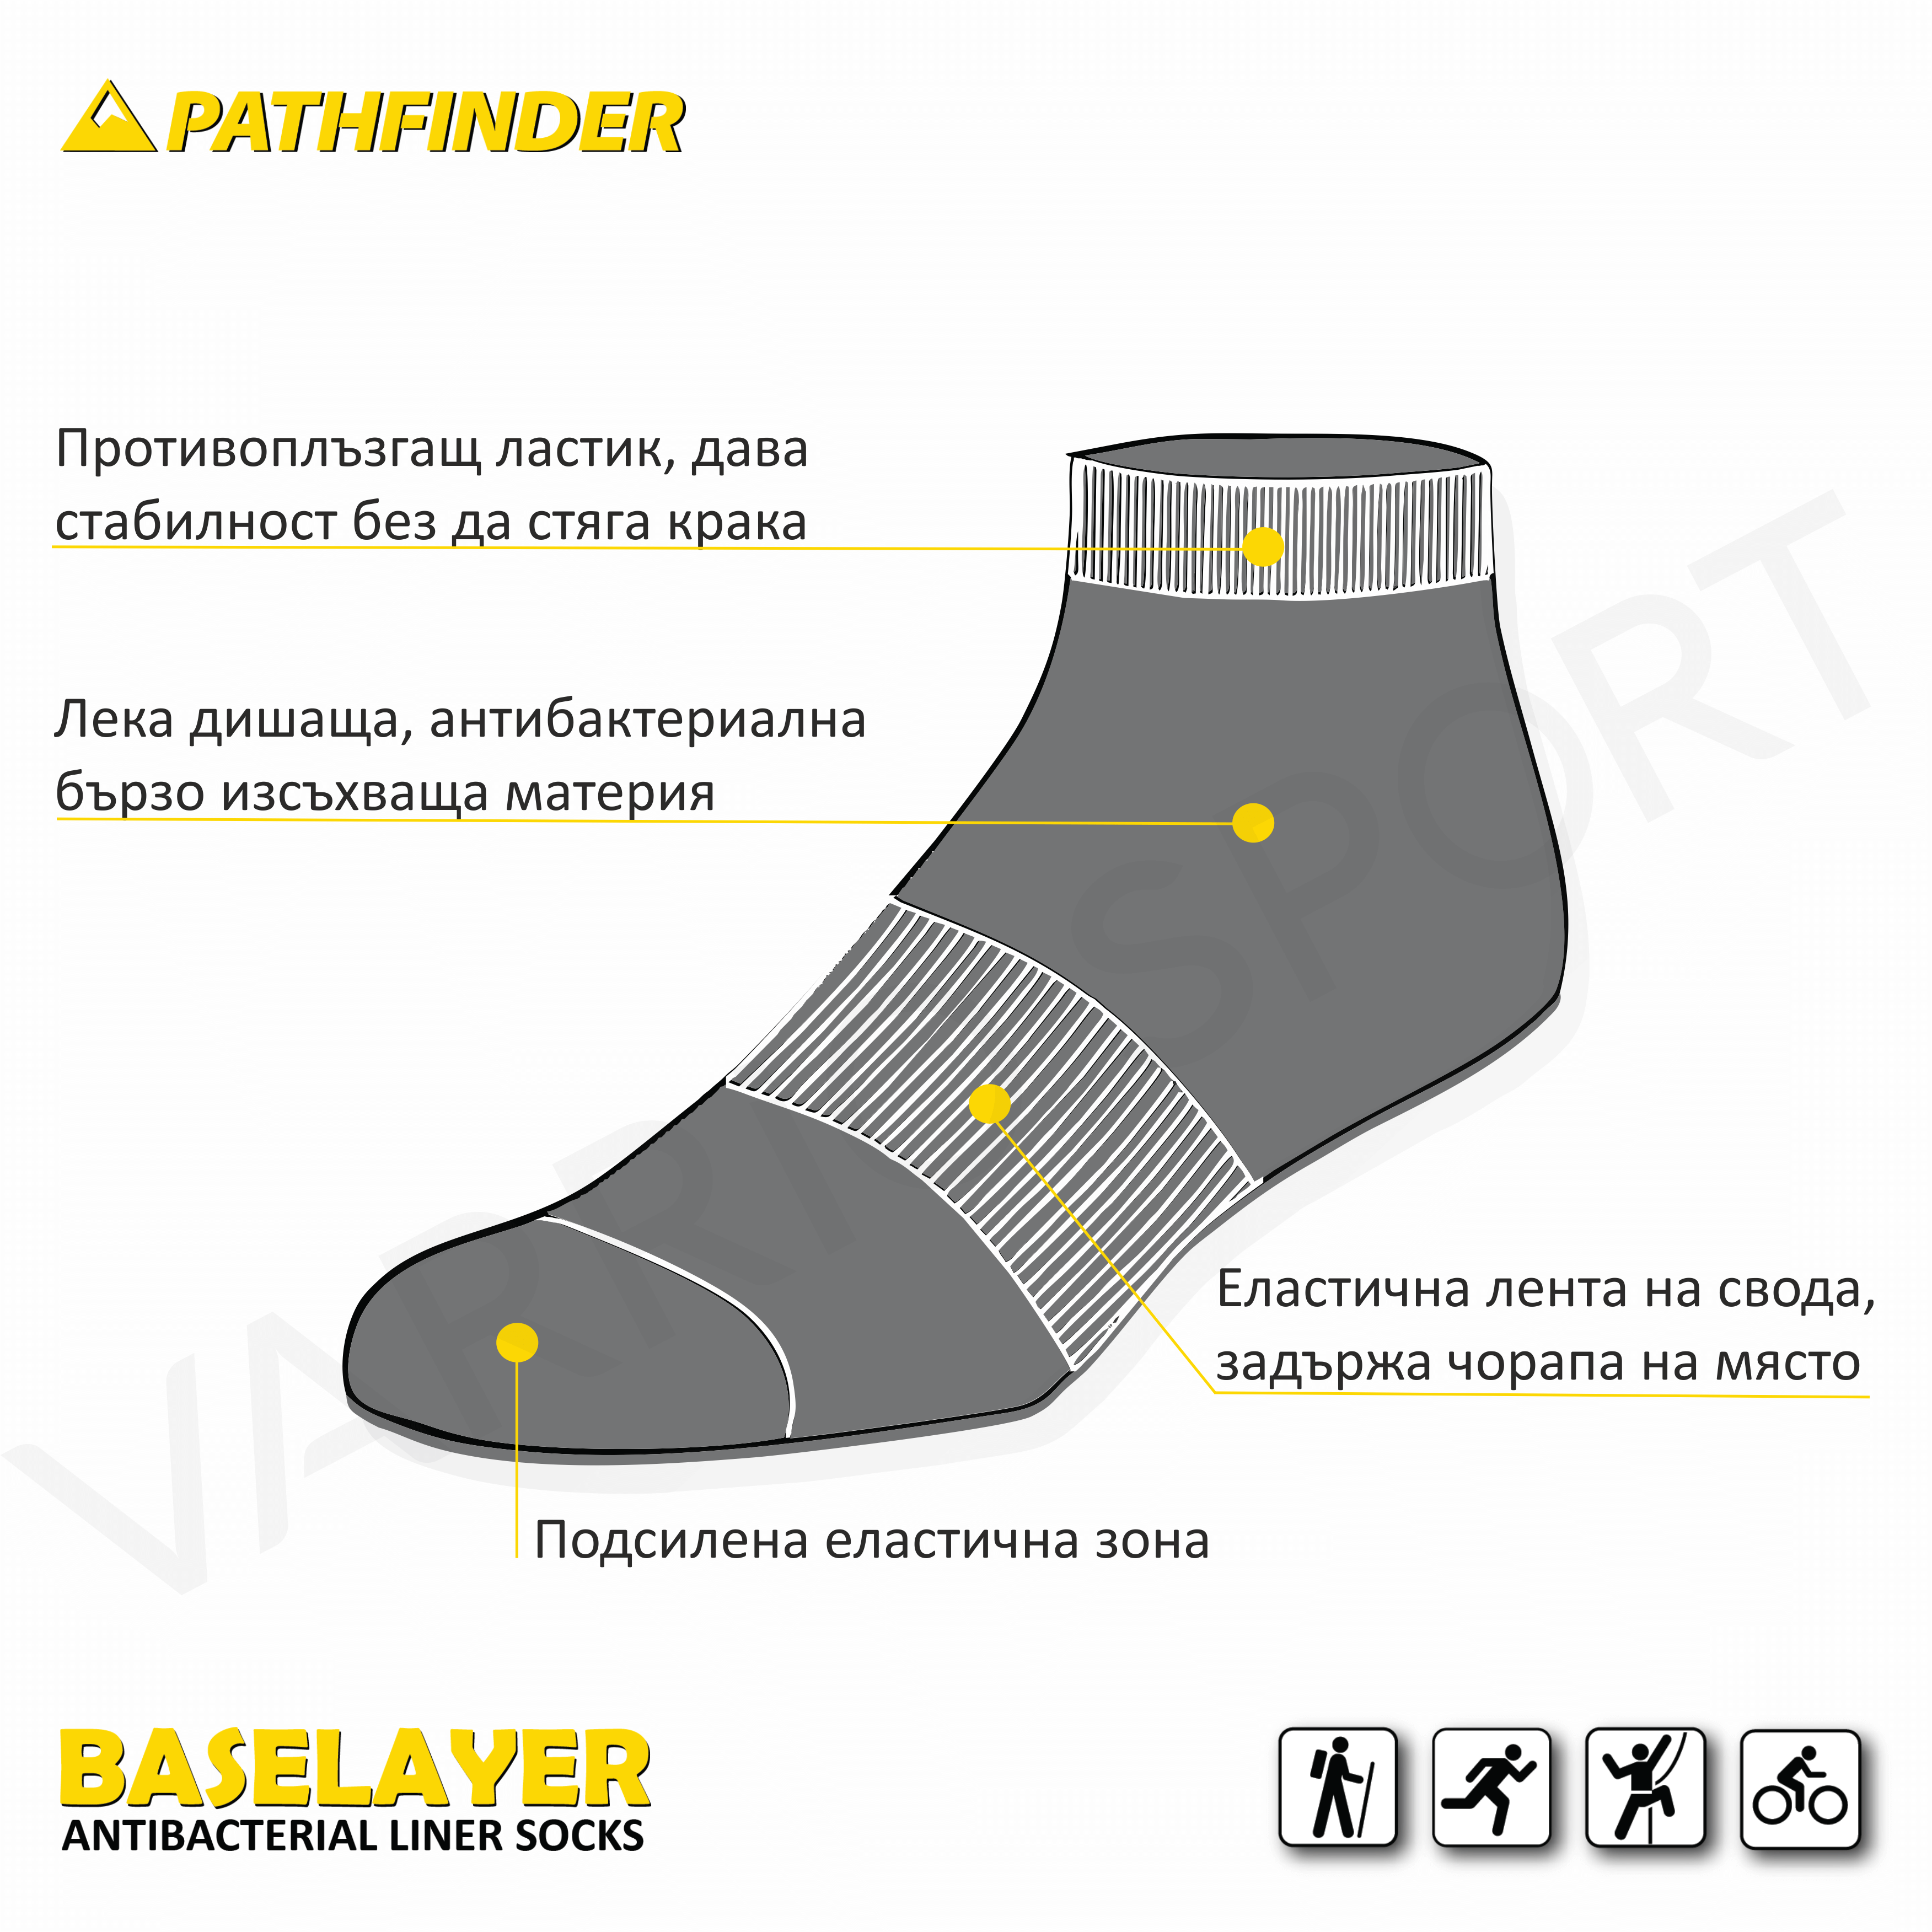 pathfinder baselayer